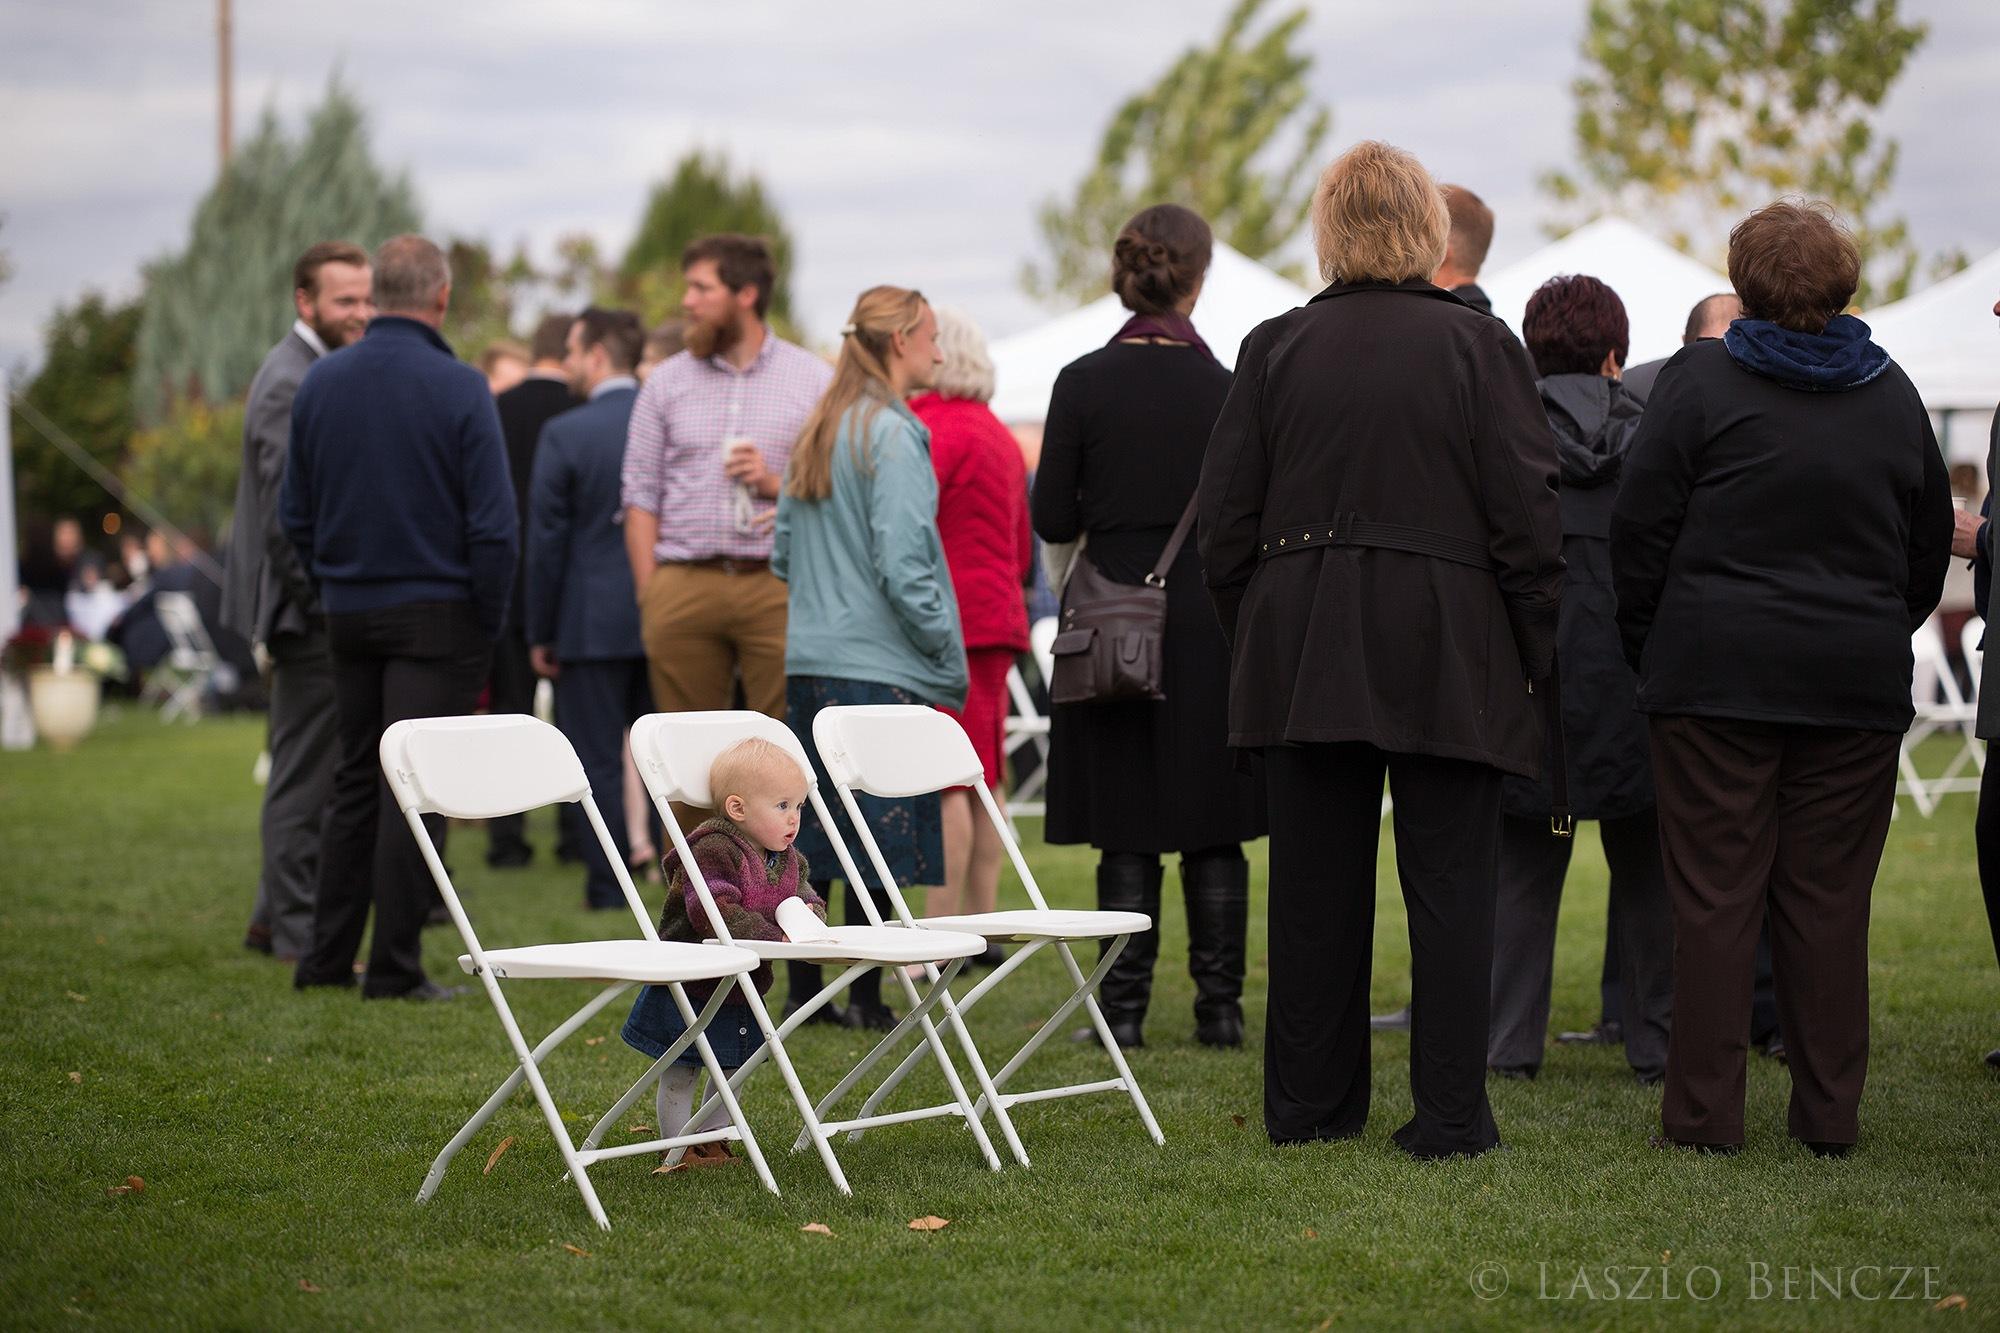 Wedding, #22, Baby in Chairs by Laszlo Bencze